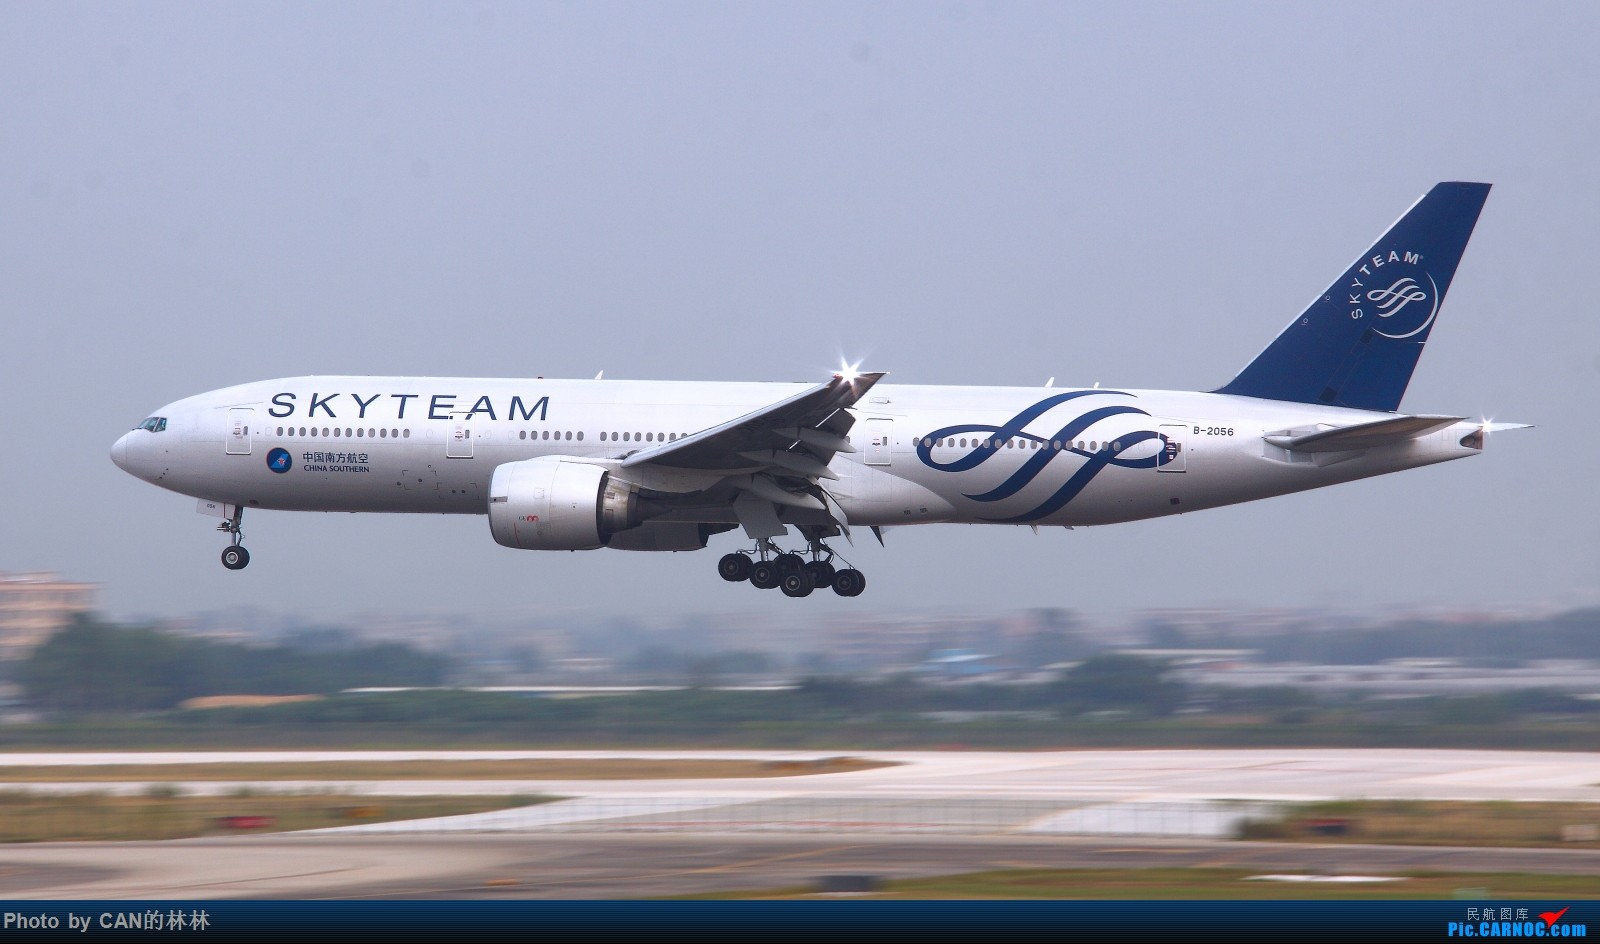 Re:[原创]发一组南航77B存货,都退了,当怀念呗,放电脑存着也发霉 BOEING 777-200 B-2056 中国广州白云国际机场